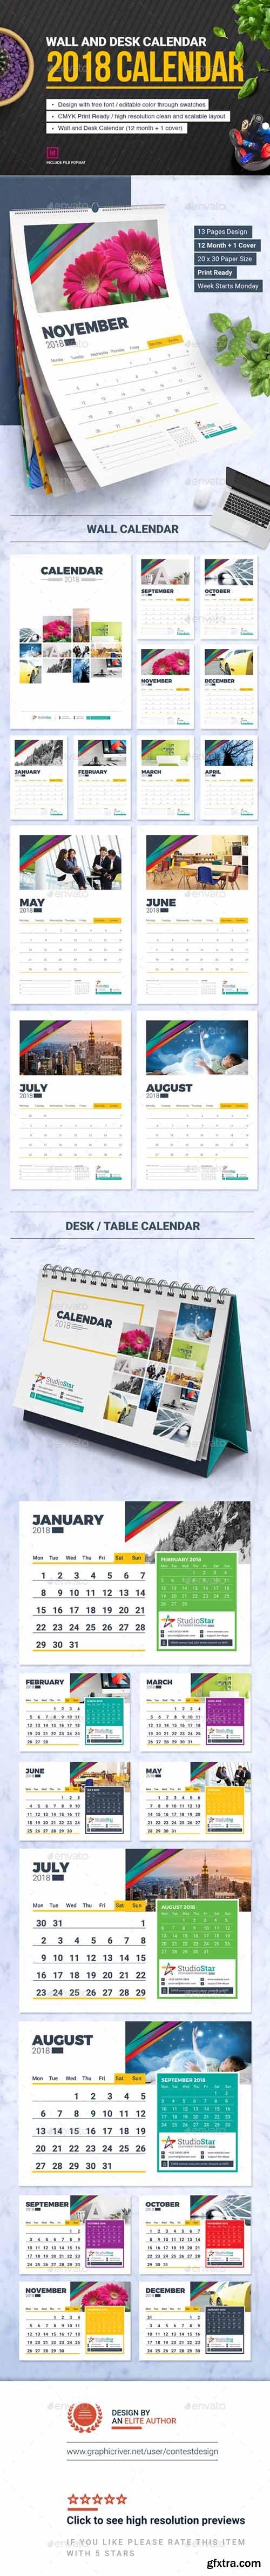 GR - 2018 Calendar Design Template | Wall and Desk / Table Calendar 2018